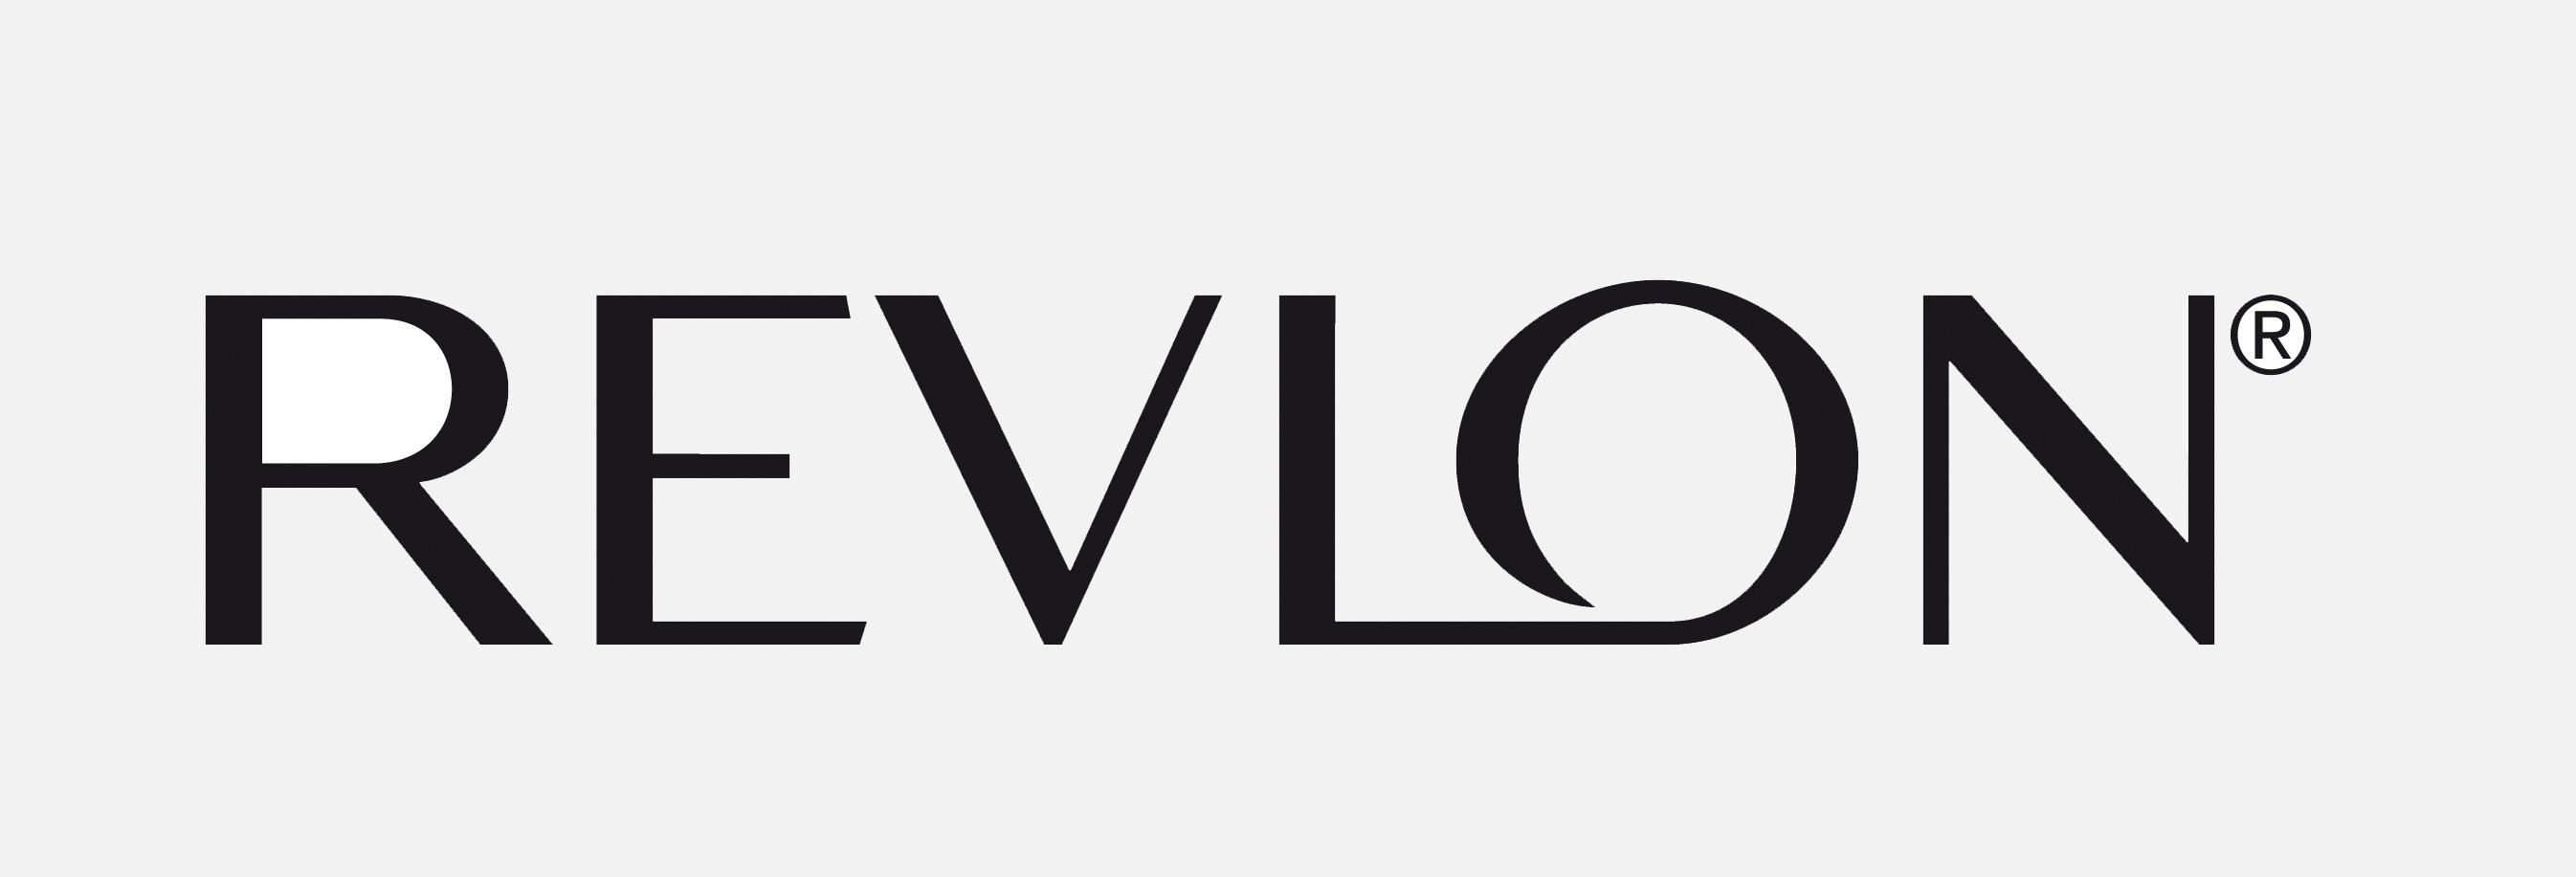 Revlon to rev up its retail stores via franchisees